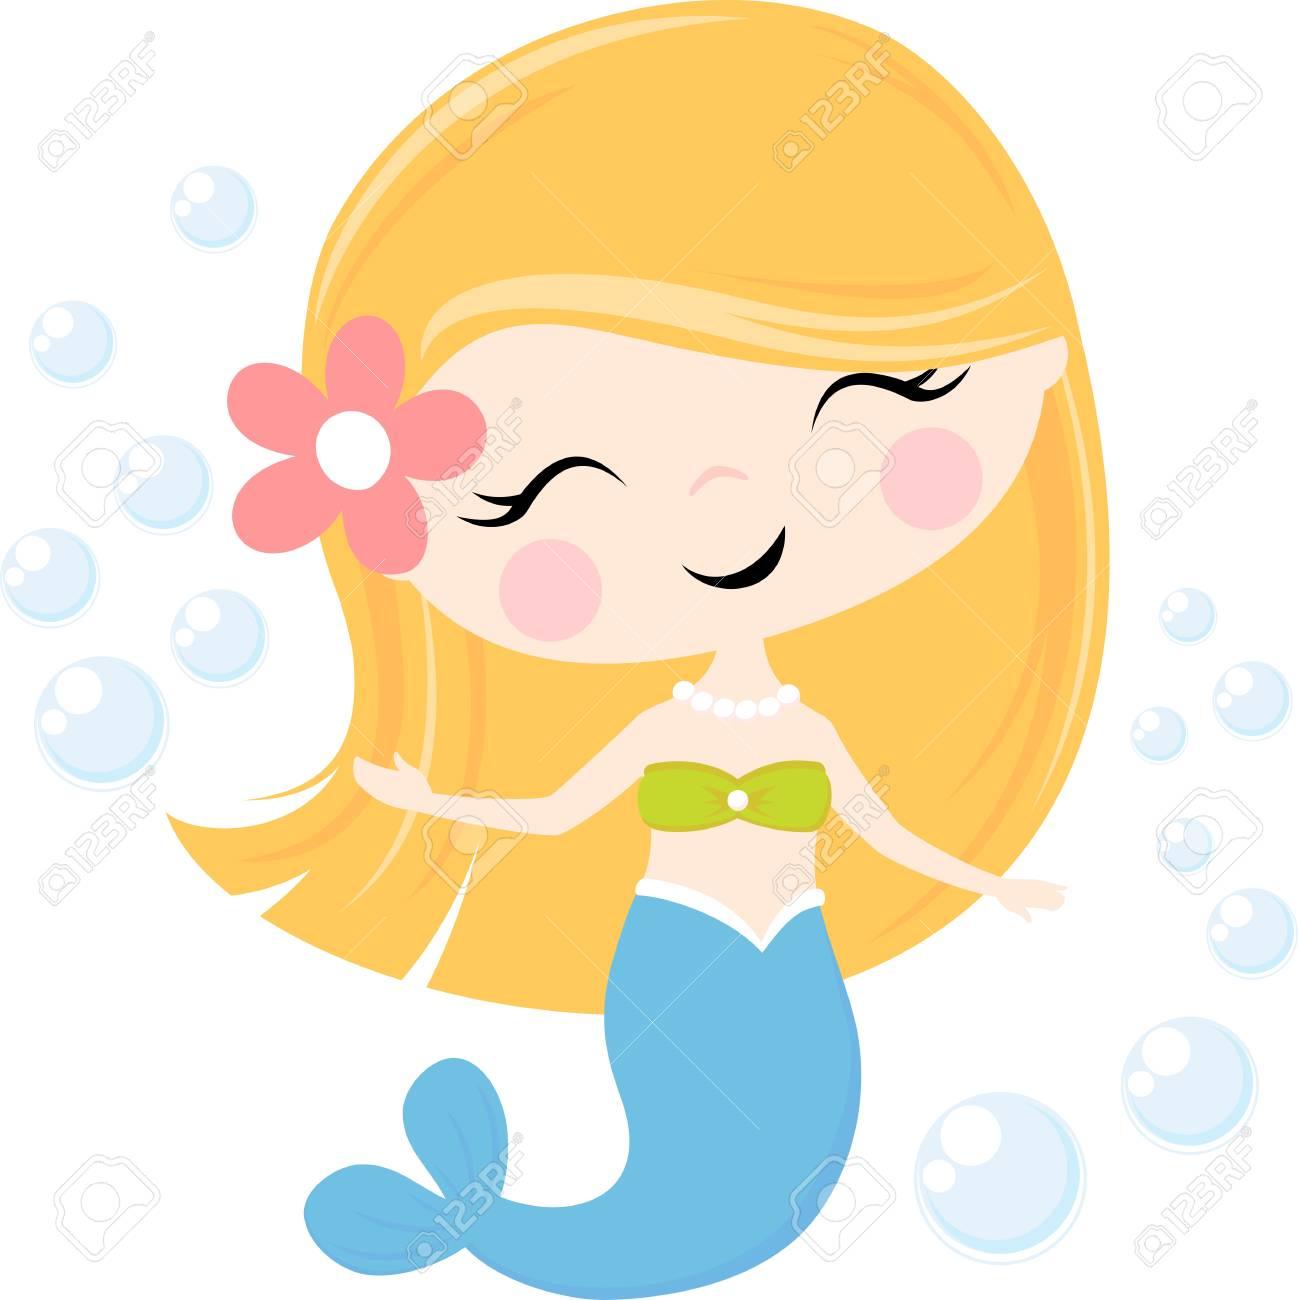 cute little mermaid illustration isolated on white, design for...